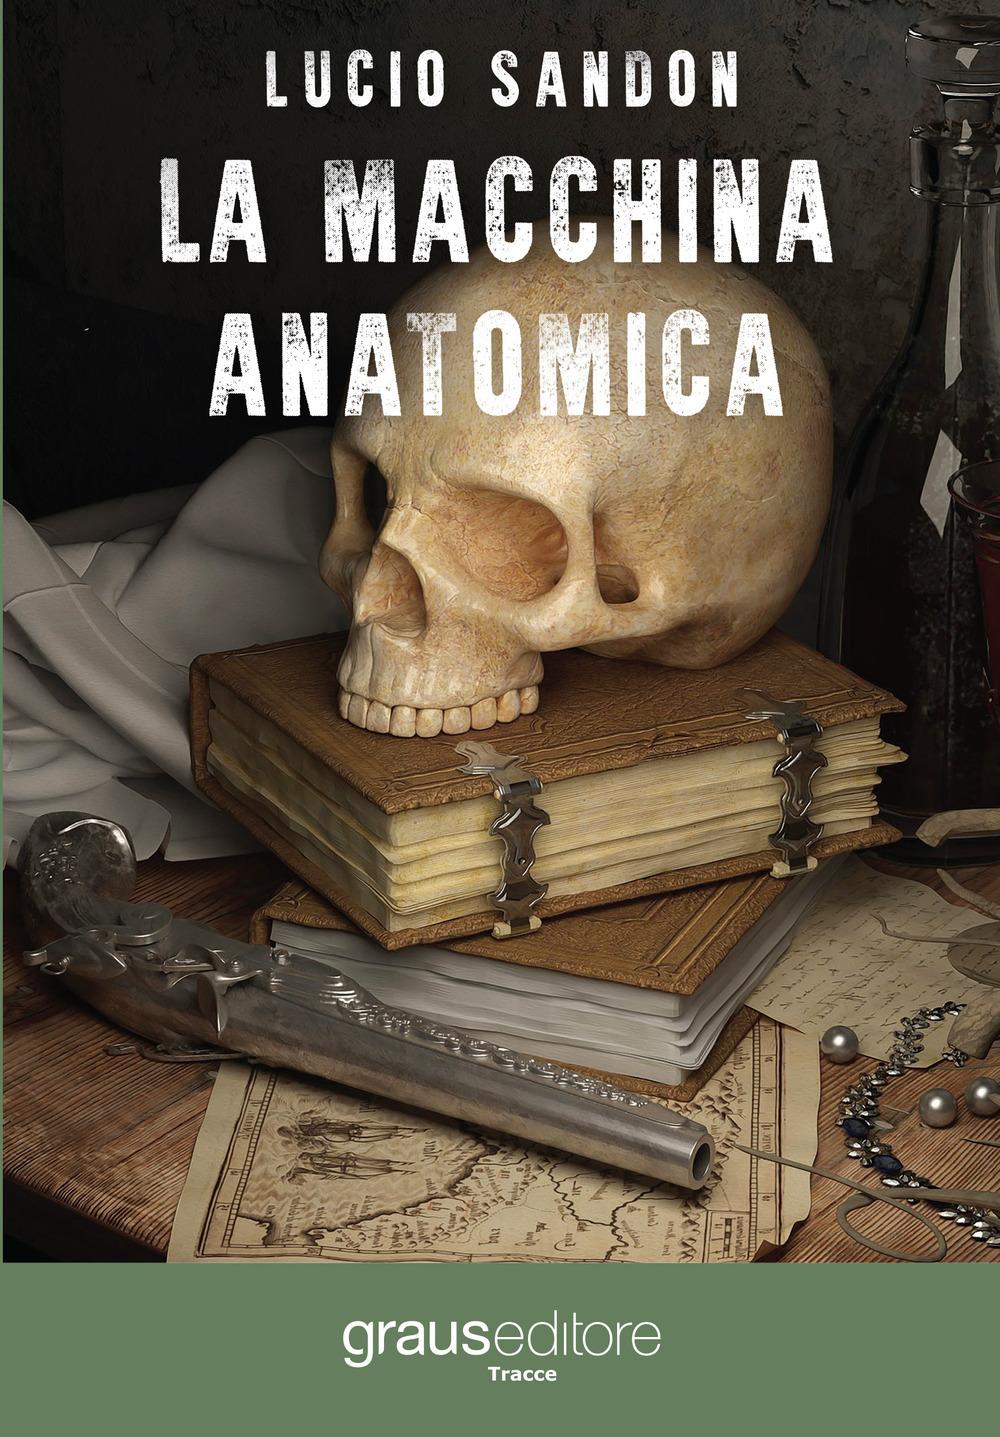 La macchina anatomica, Lucio Sandon